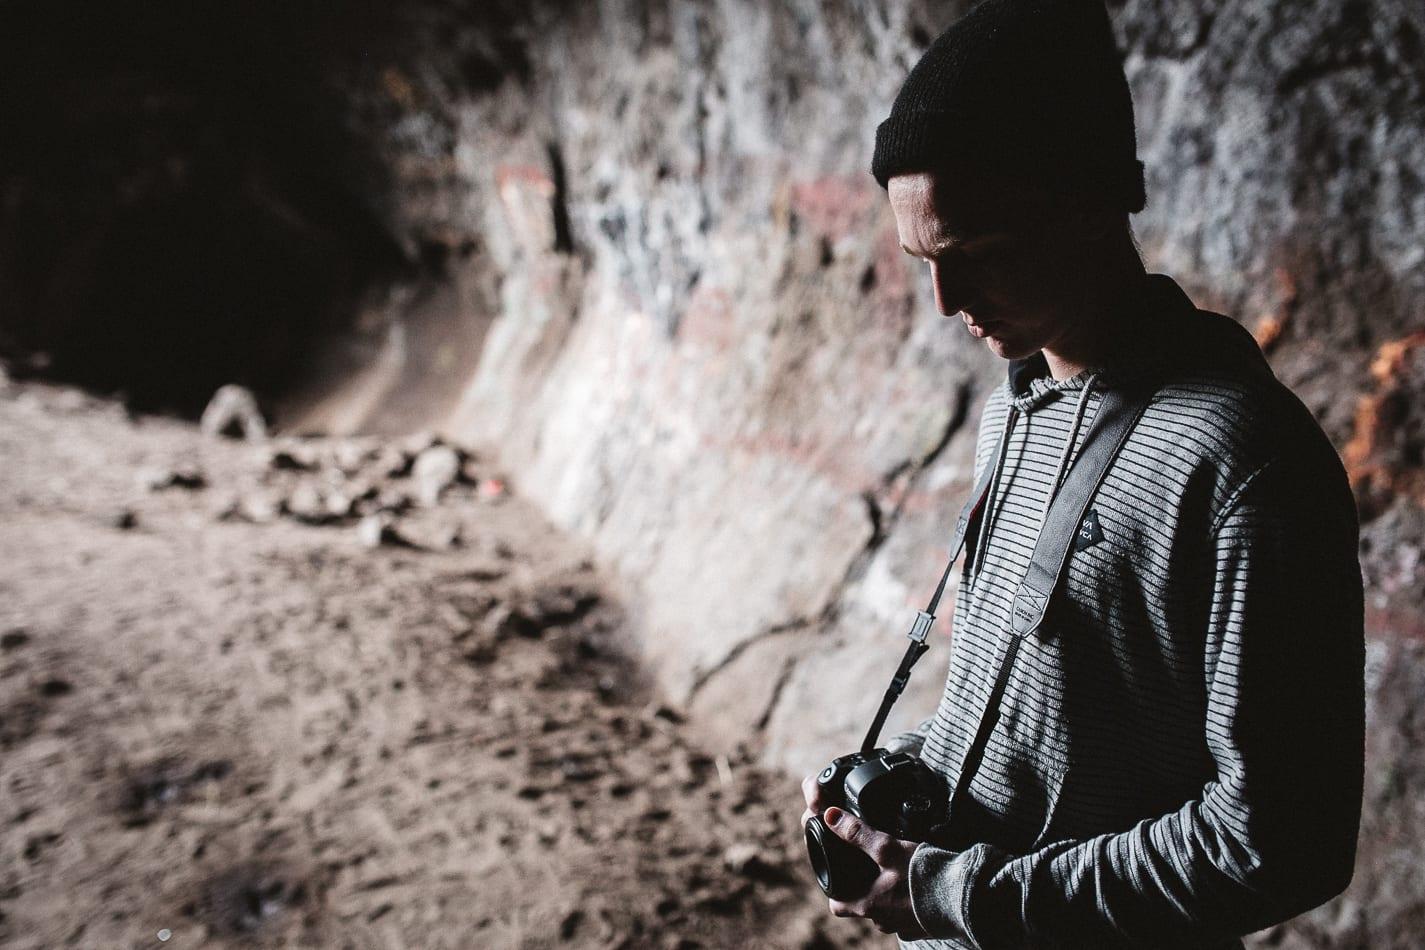 pluto-cave-mount-shasta-lifestyle-portrati-photo-20